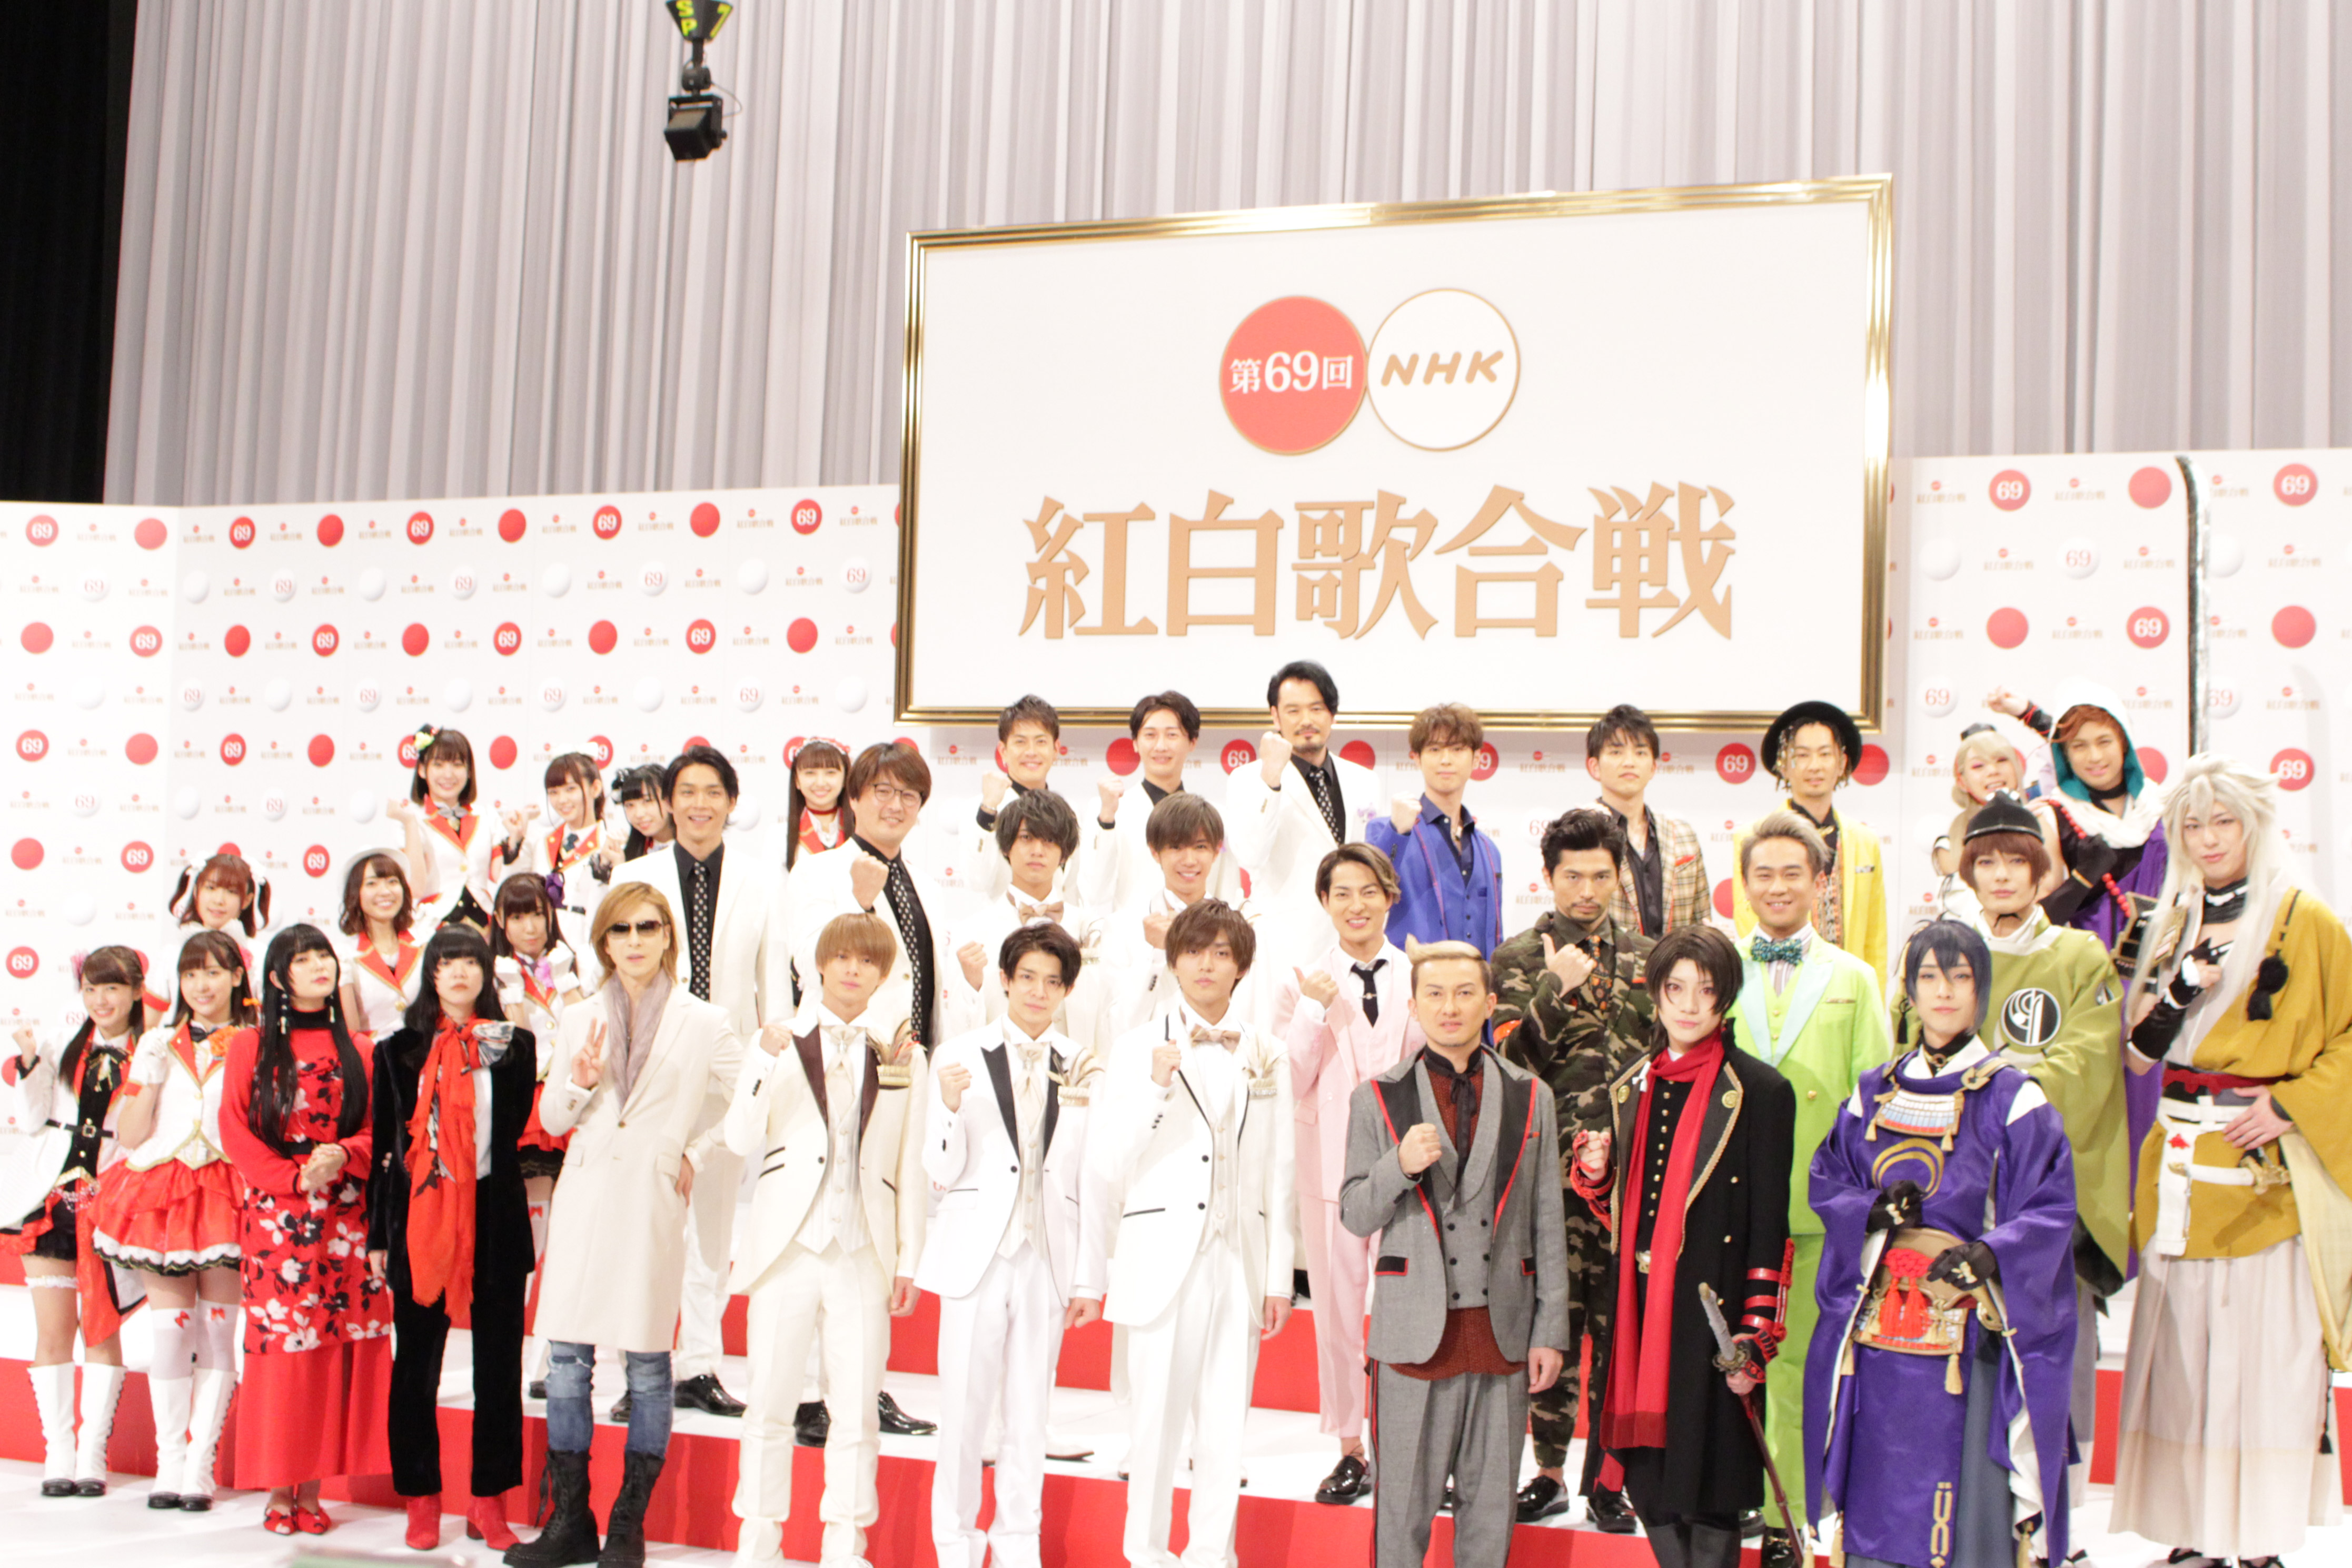 YOSHIKI feat. HYDE、『NHK紅白歌合戦』へ出場「新人の気分です」 | BARKS